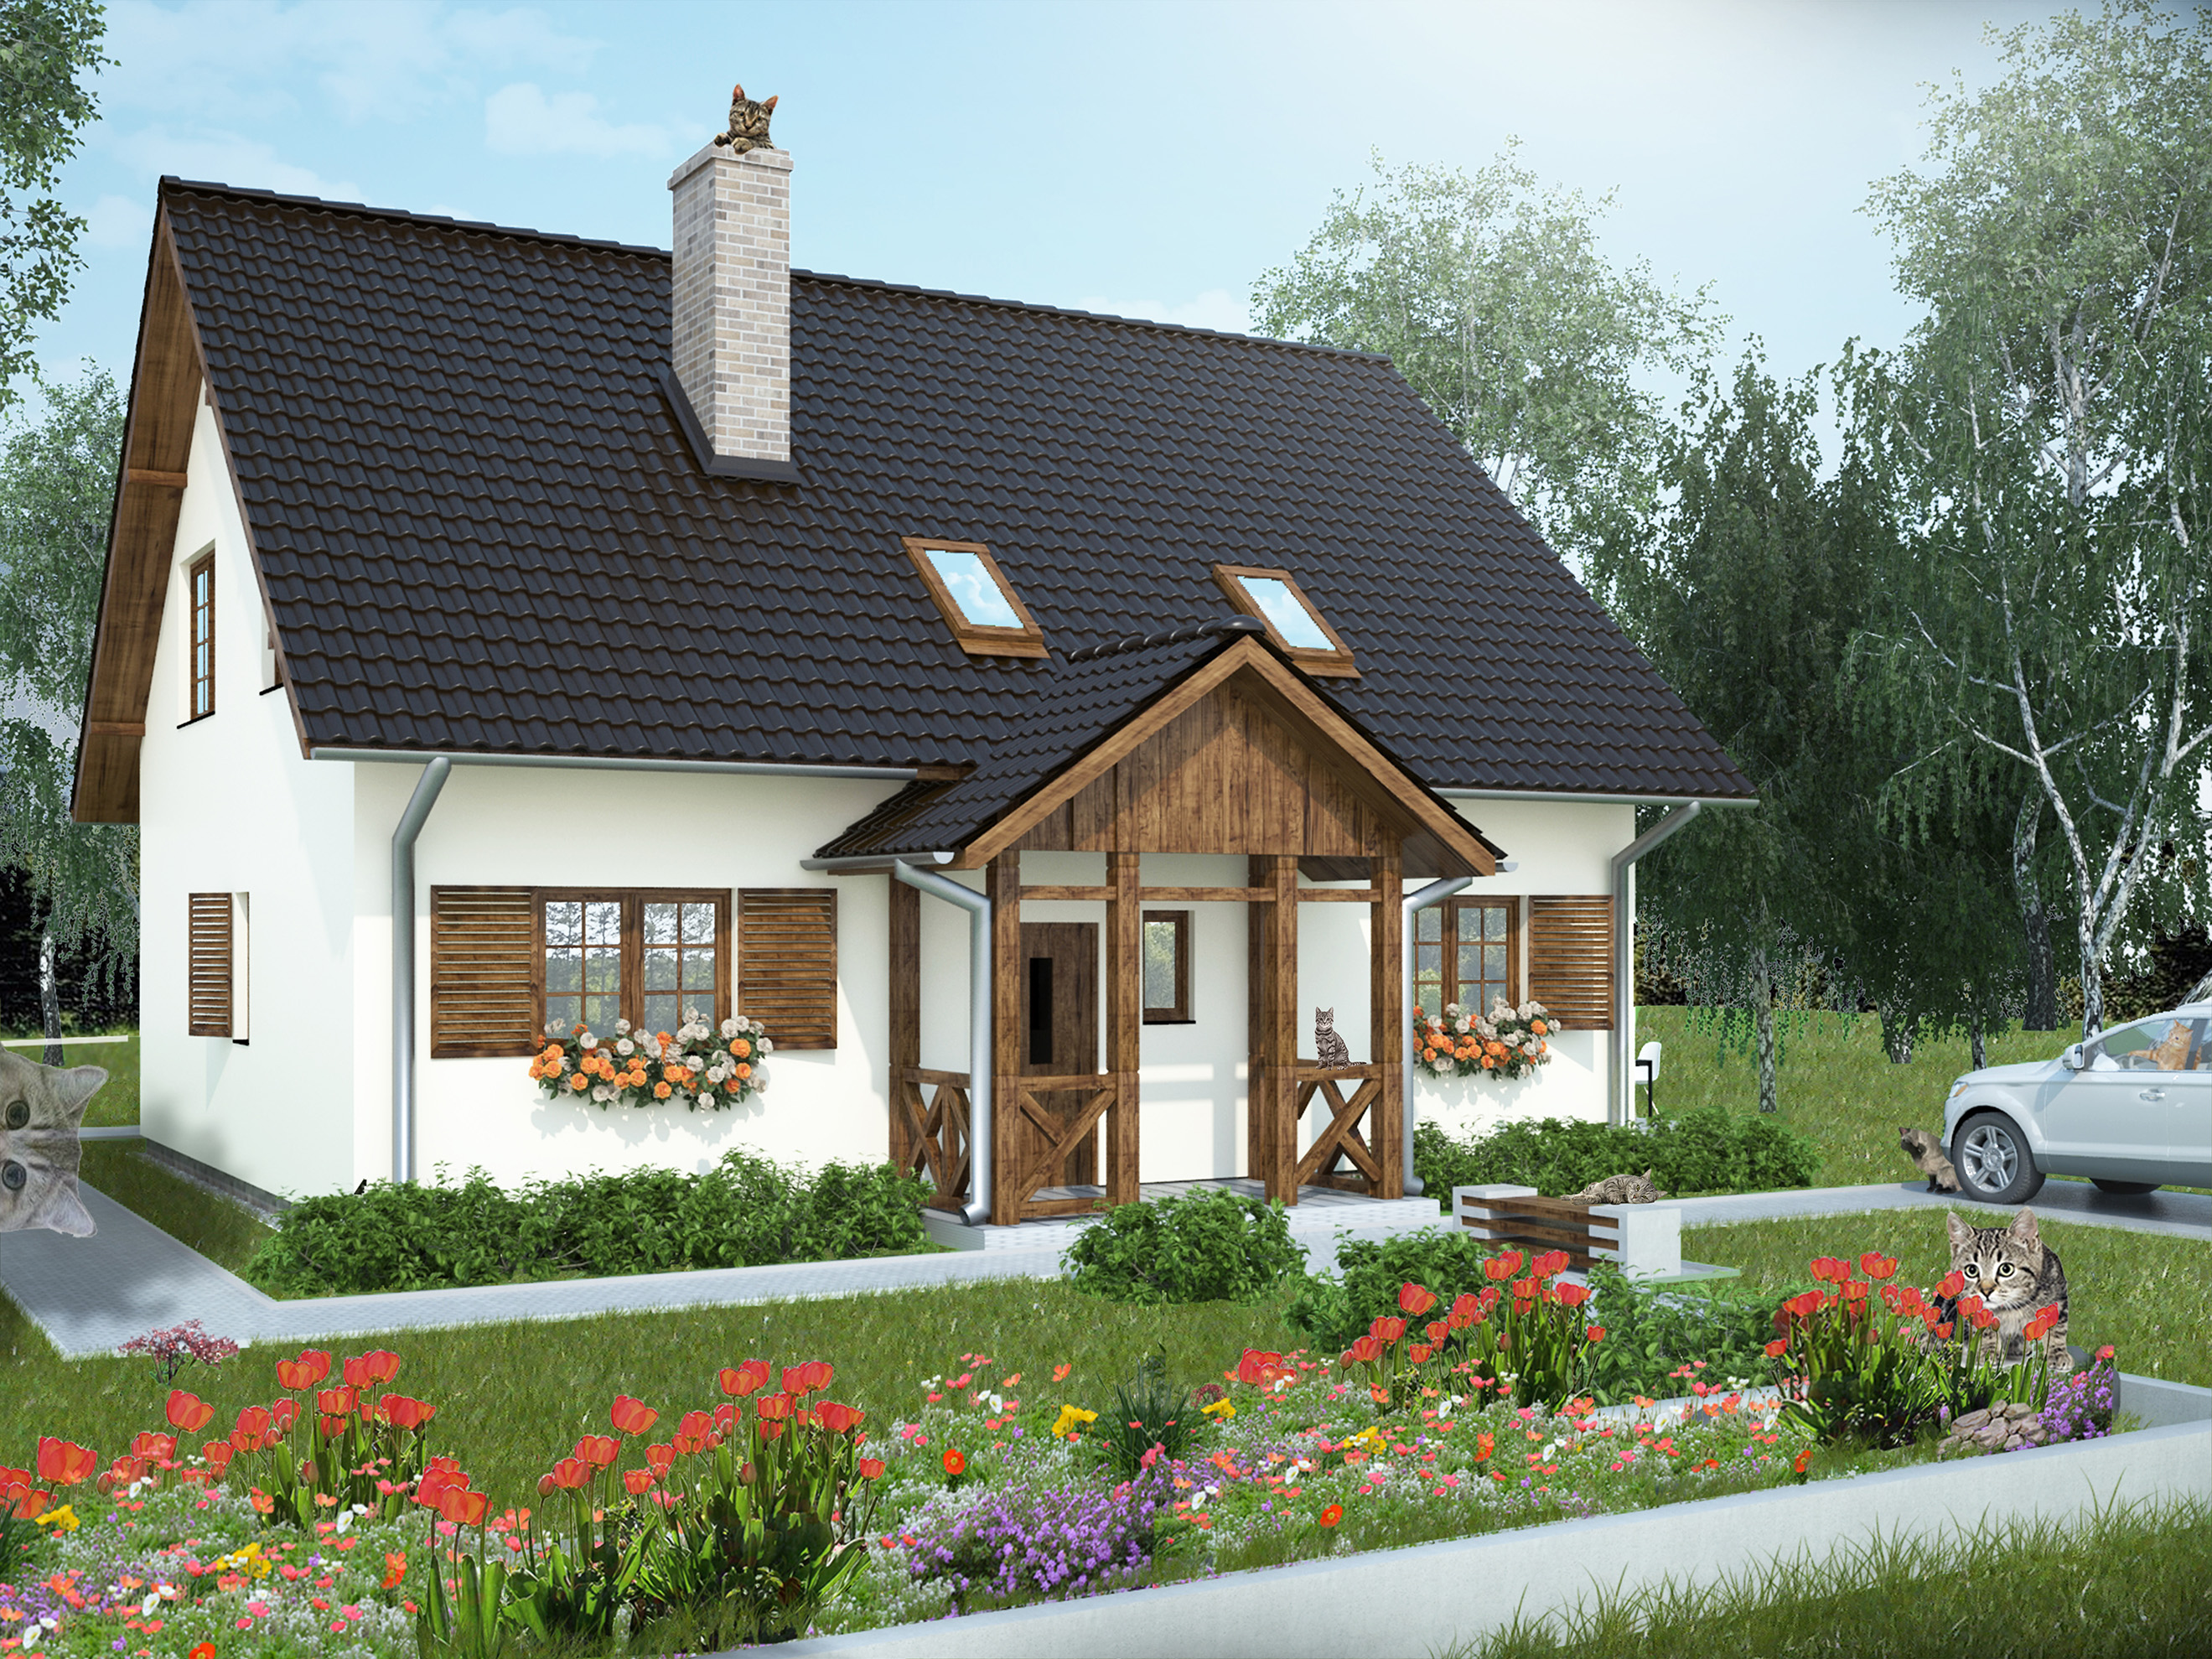 Wiejski domek